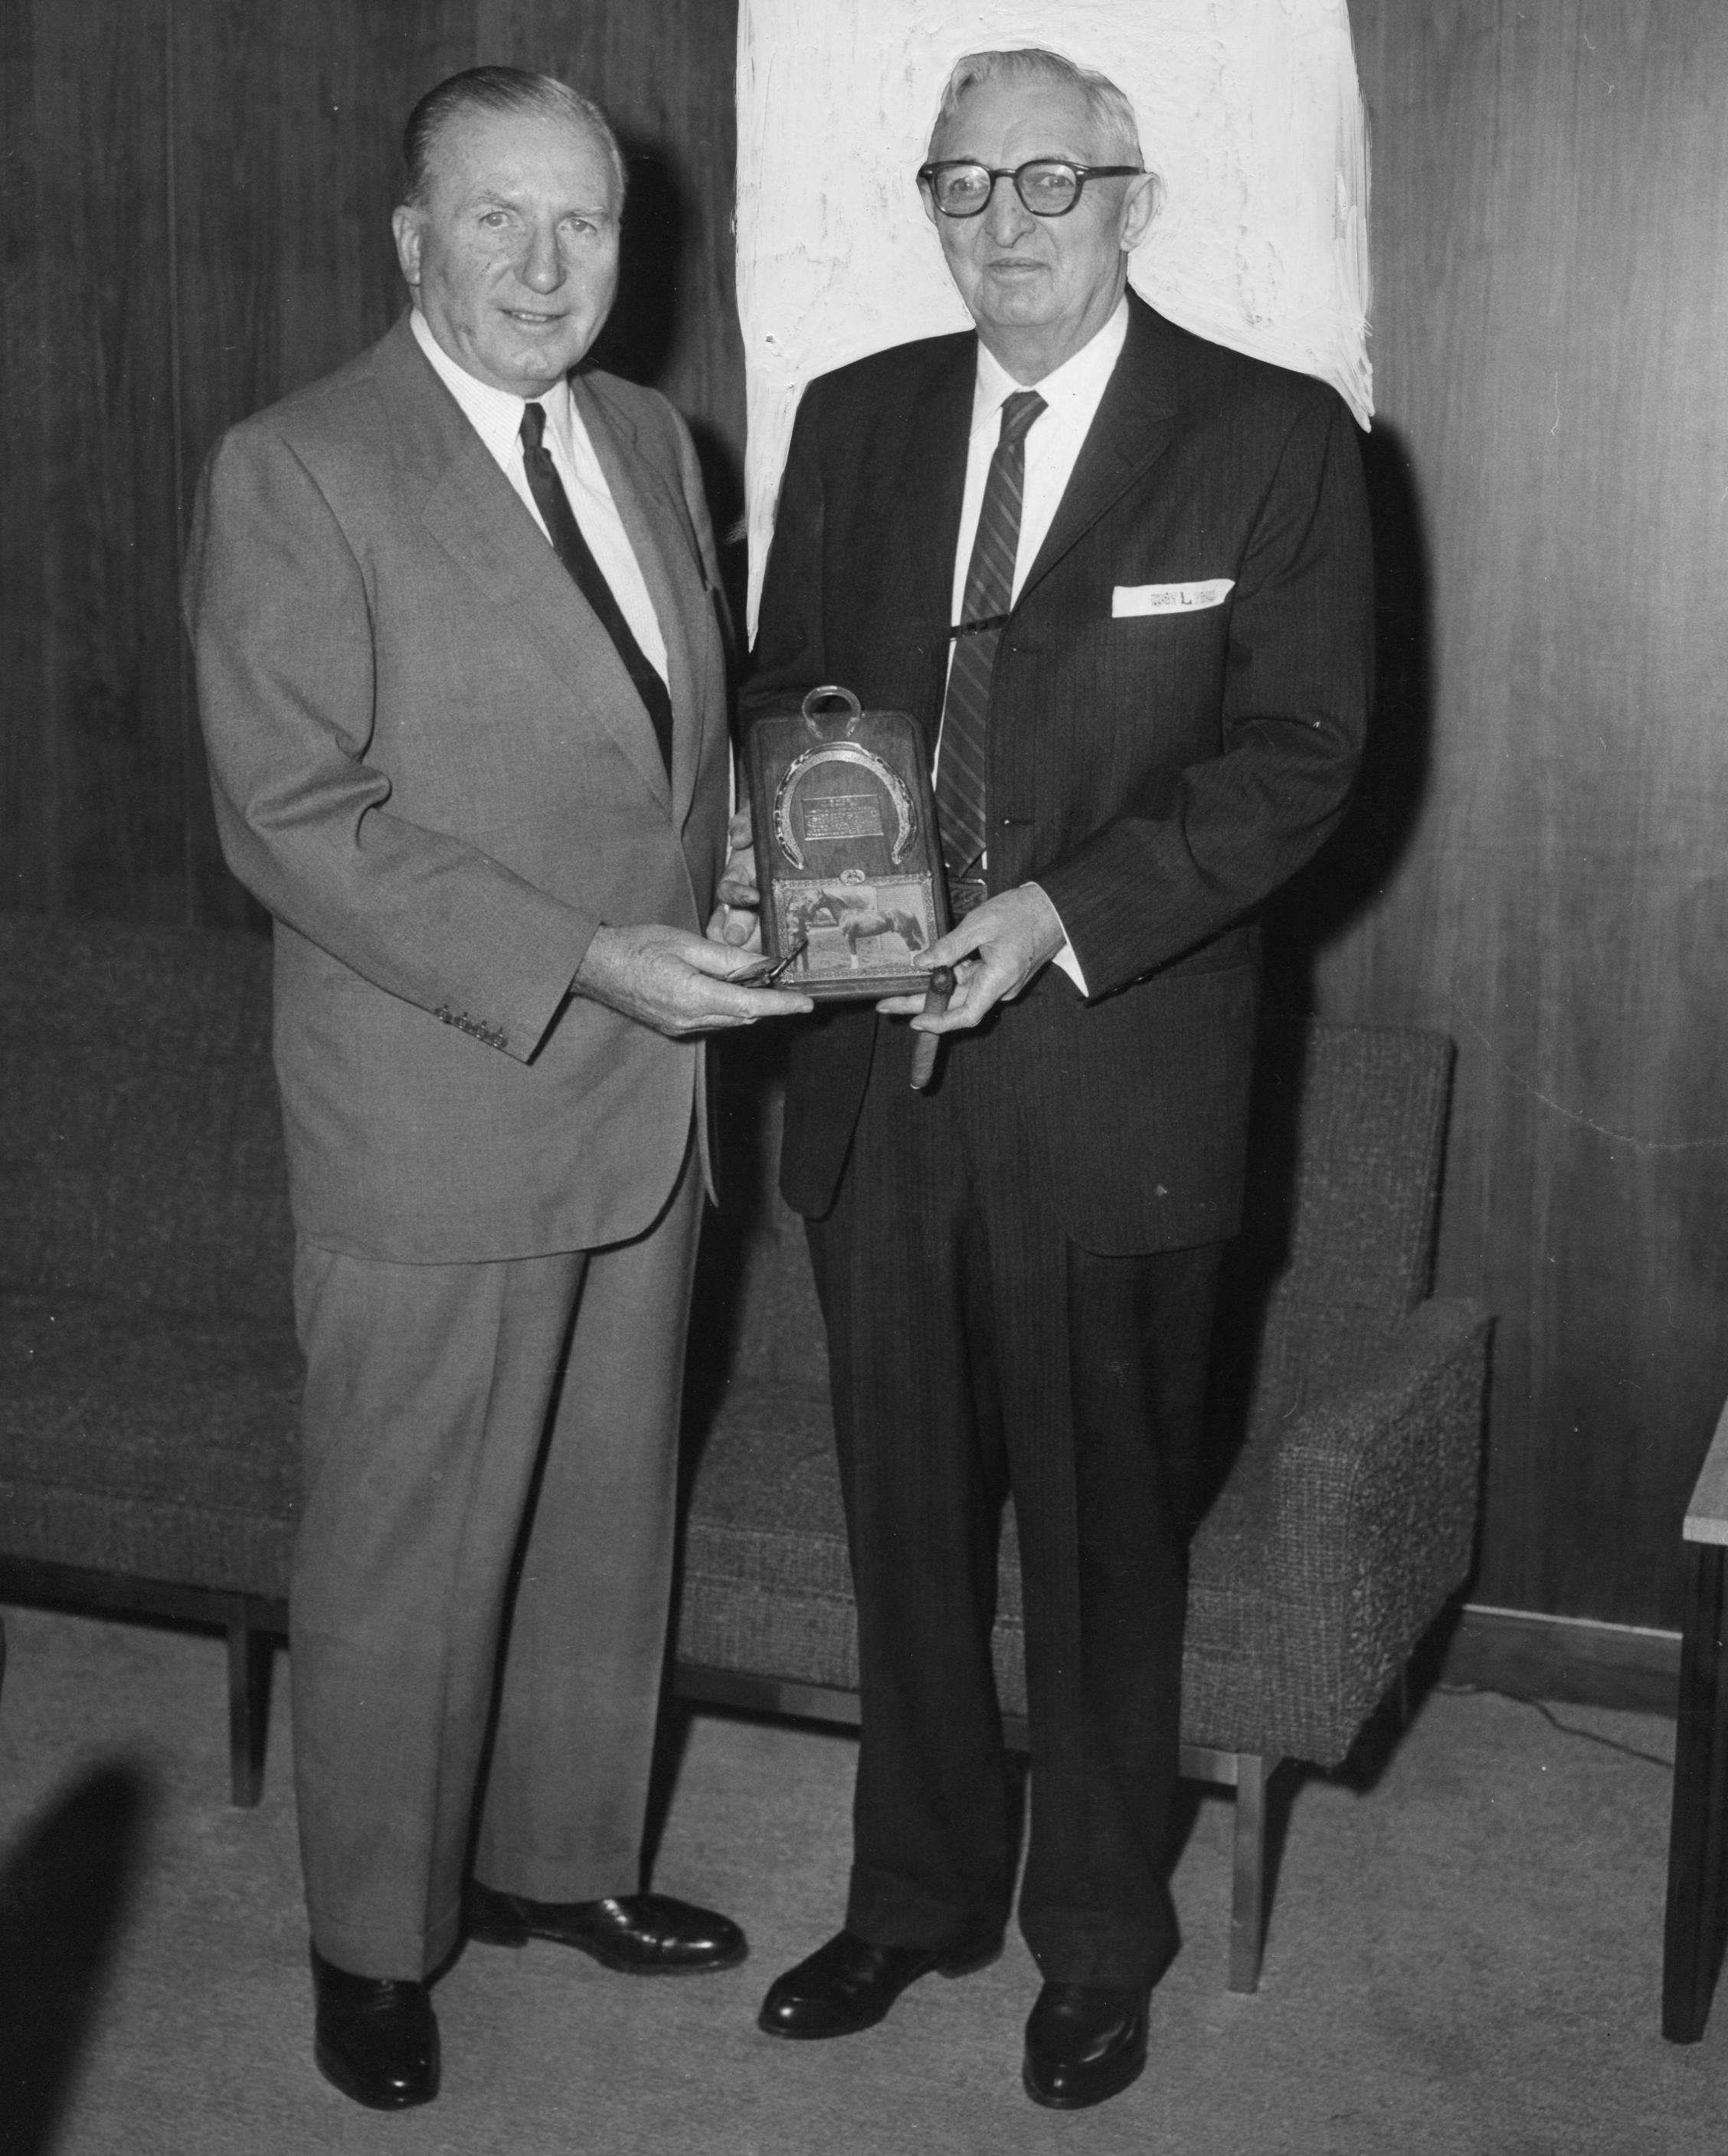 John Hanes presents Louis Feustel with an award (Bert and Richard Morgan/Museum Collection)